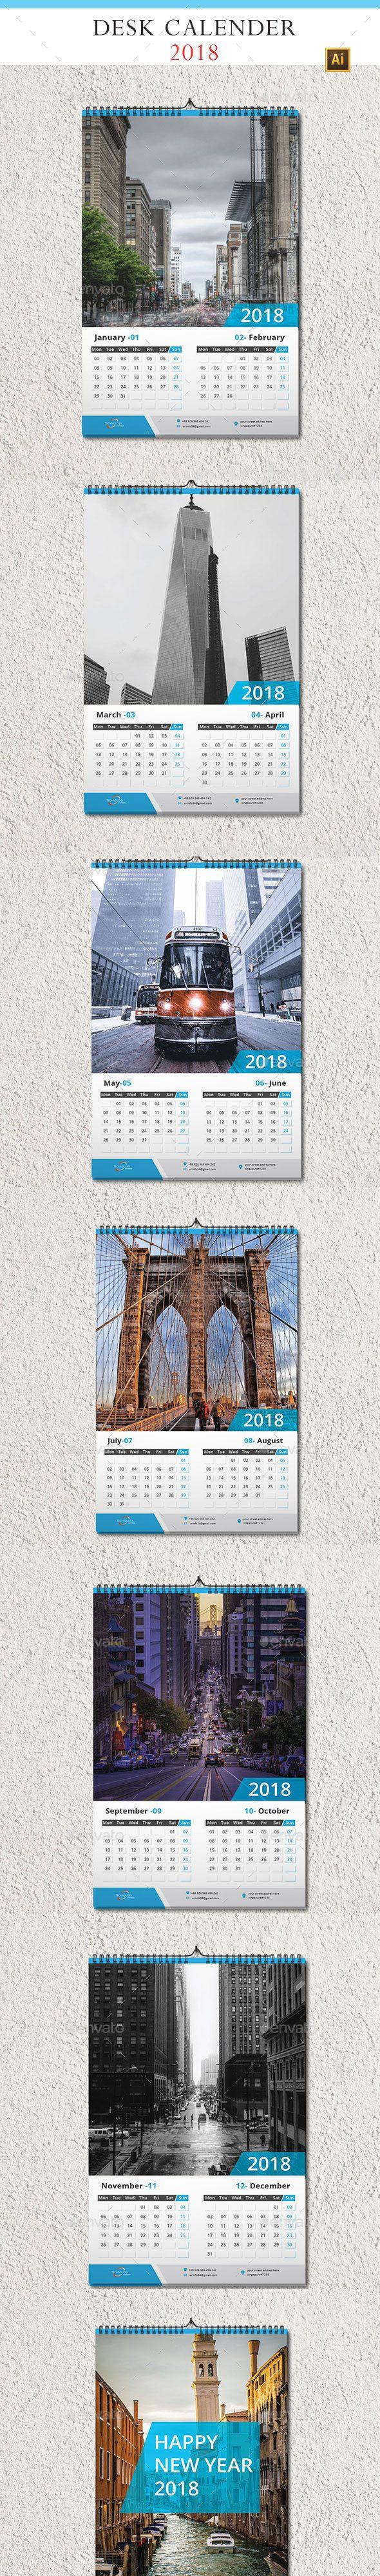 Wall Calendar 2018 - #Calendars #Stationery Download here: https://graphicriver.net/item/wall-calendar-2018/20041844?ref=alena994